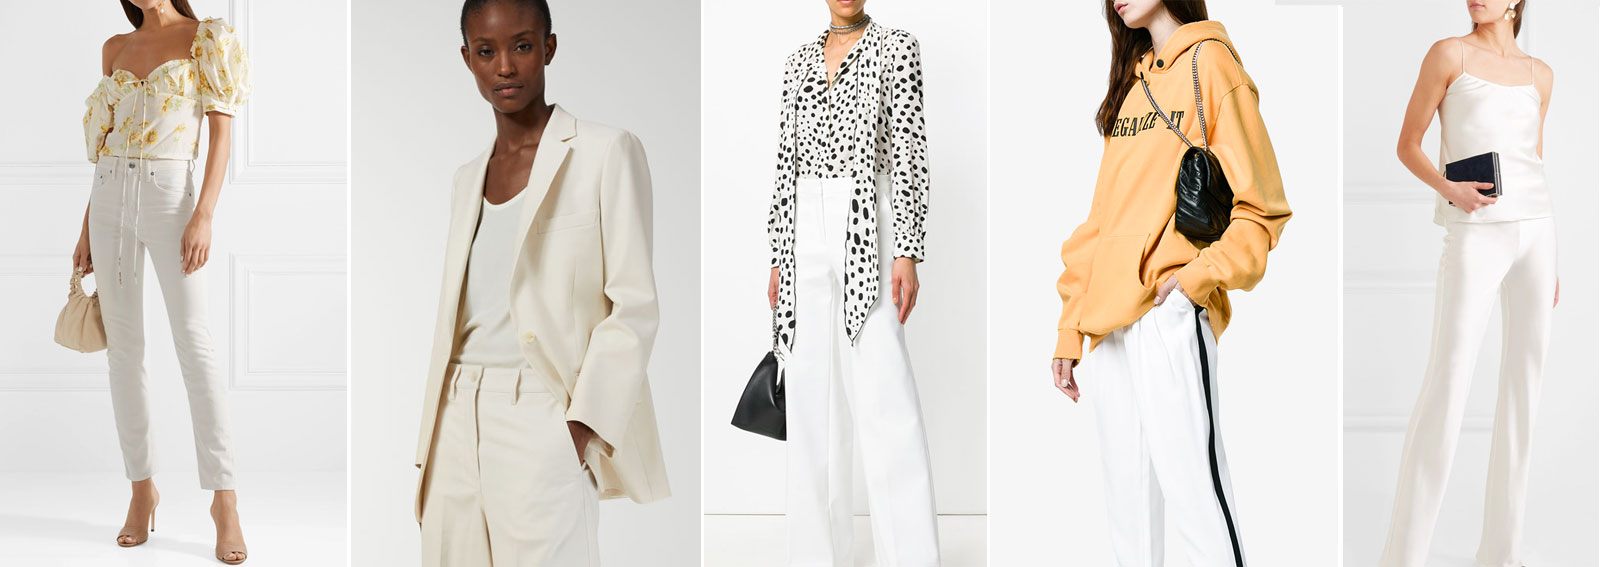 COVER-pantaloni-bianchi-styling-ecommerce-DESKTOP